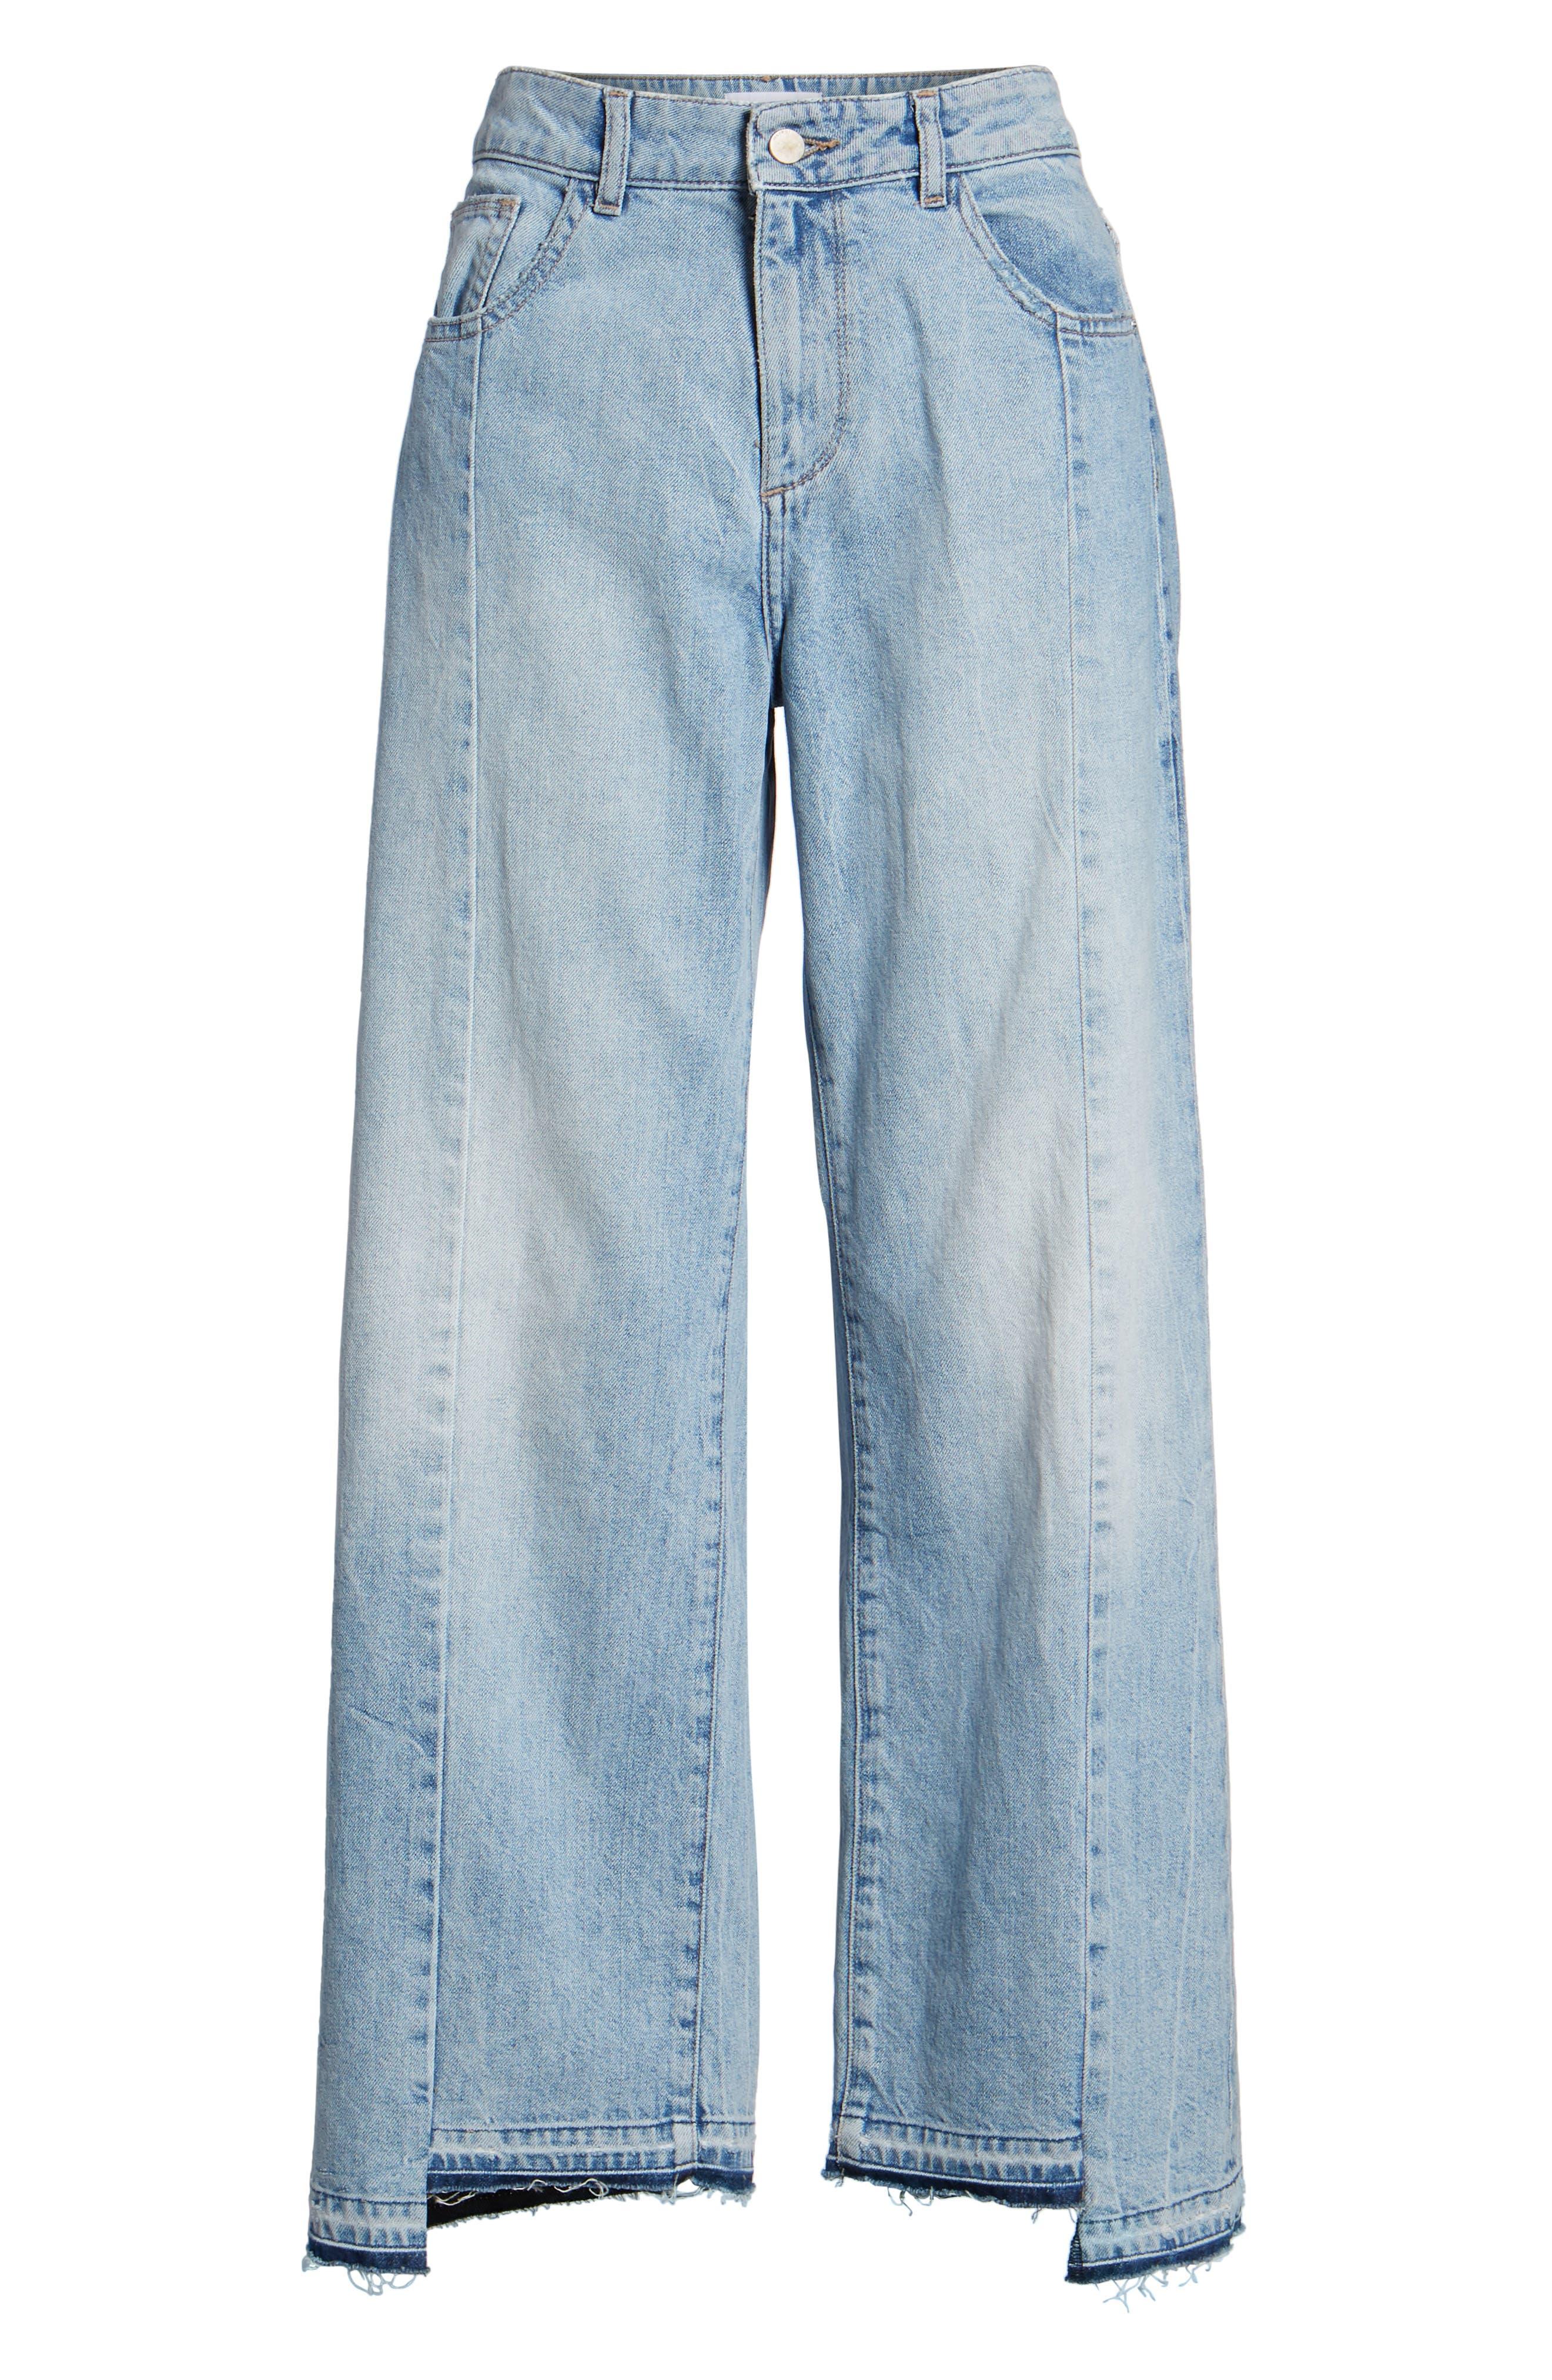 Hepburn High Waist Wide Leg Jeans,                             Alternate thumbnail 8, color,                             Oldtown